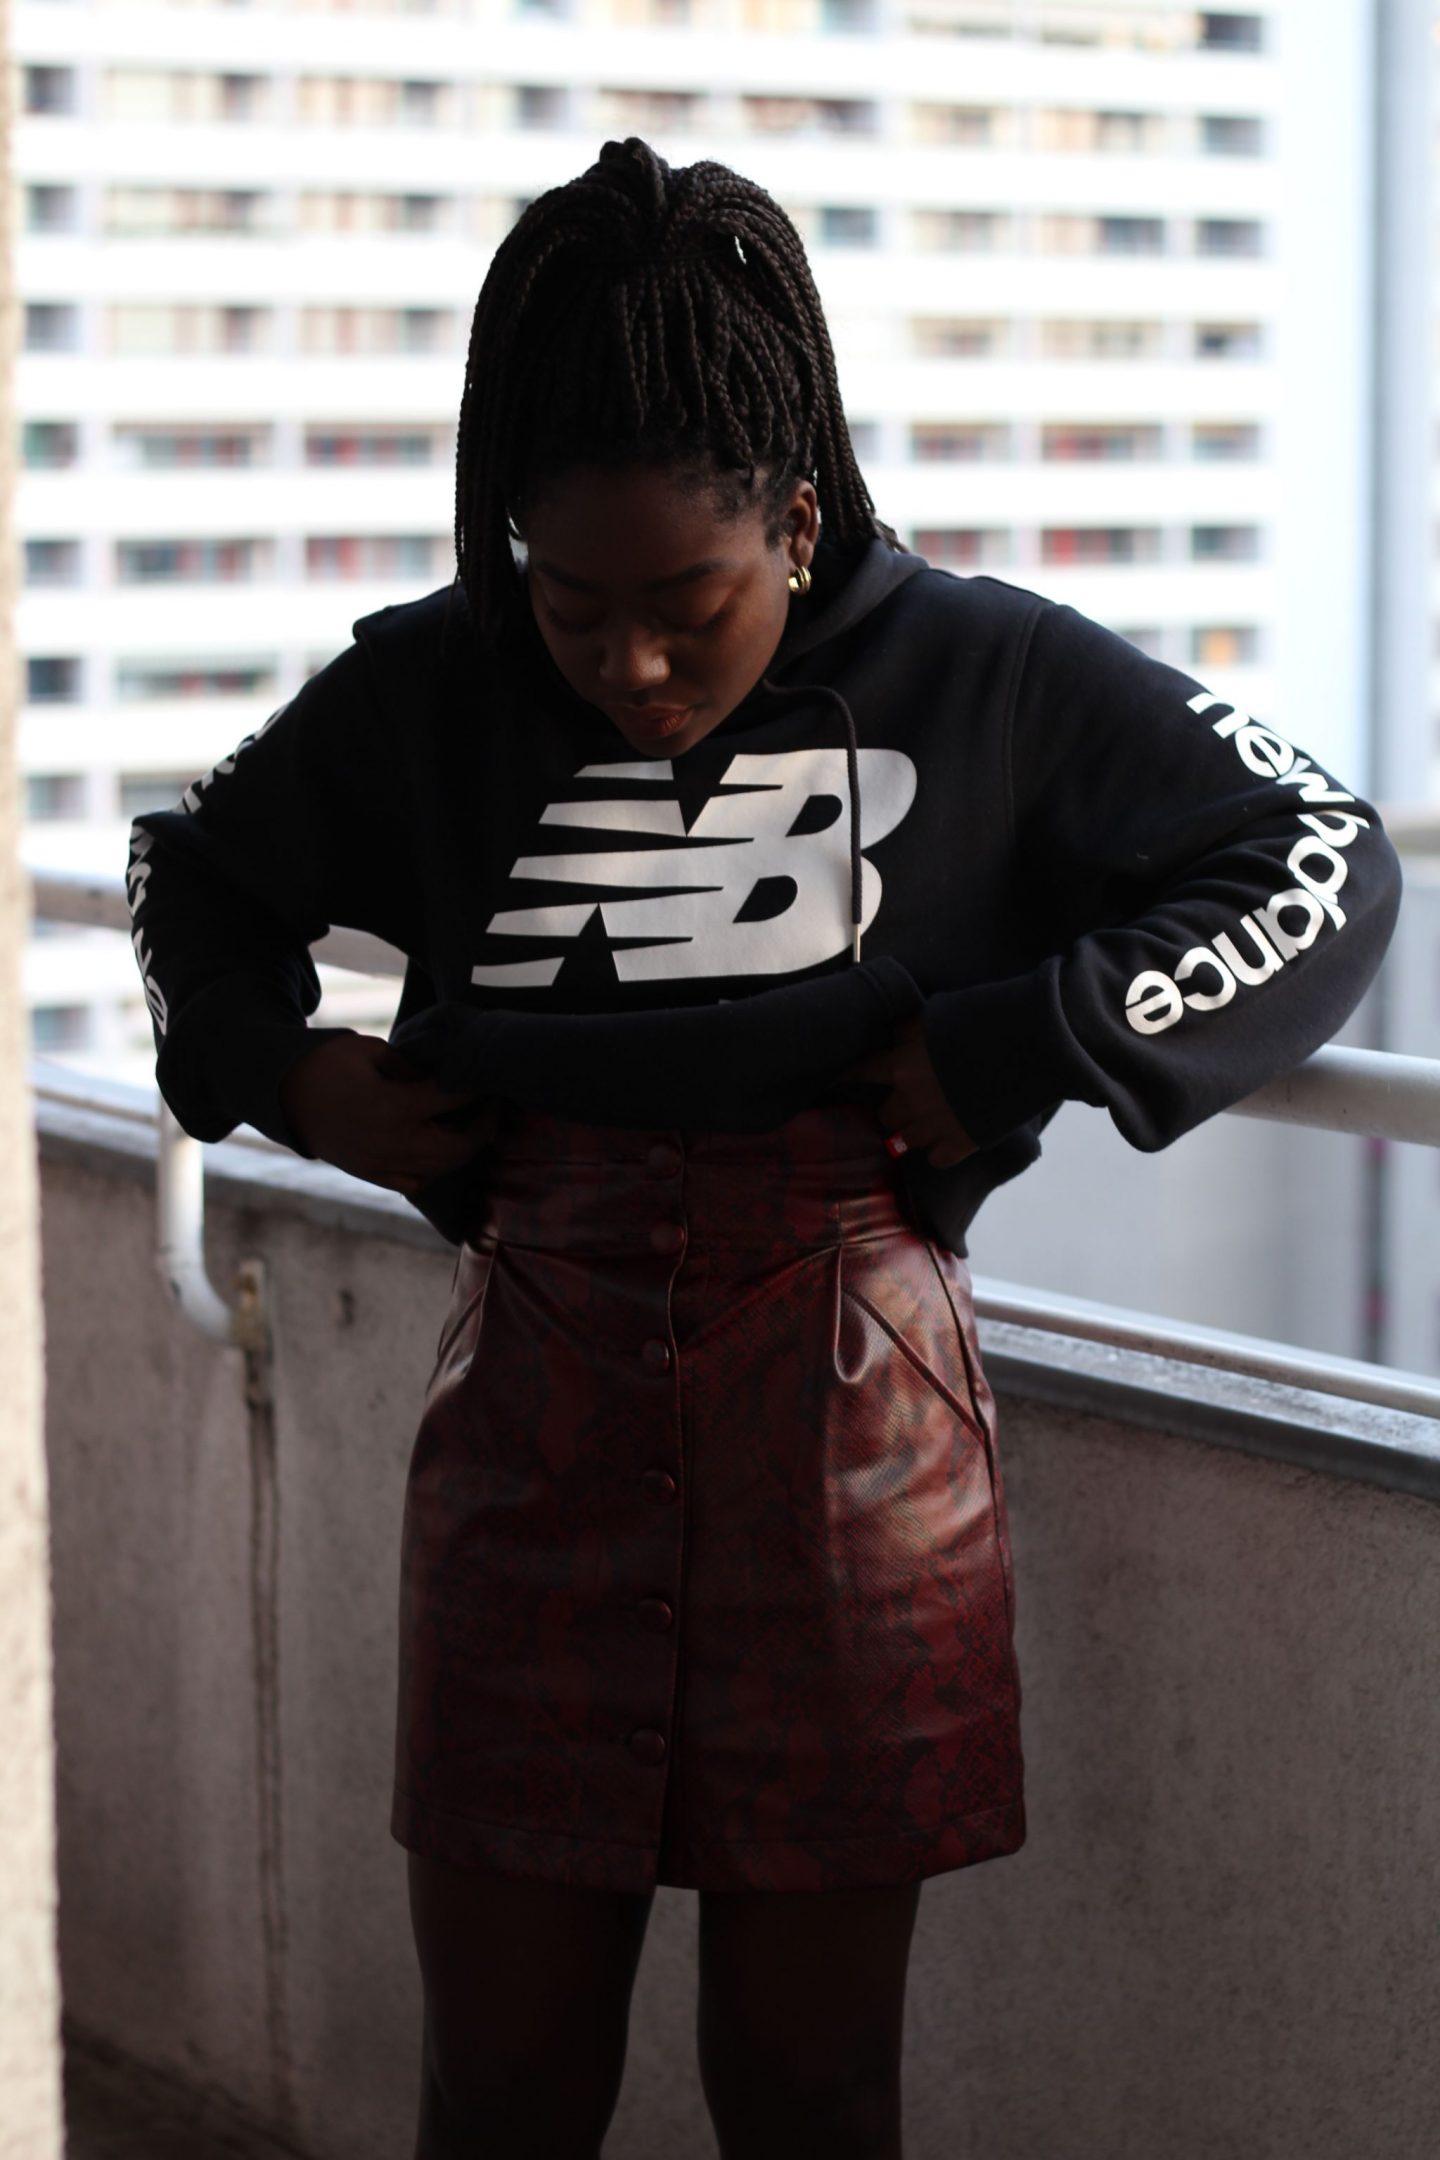 streetwear_chic_newbalance_lois_opoku_fashion_blog_style_berlin_lisforlois_3